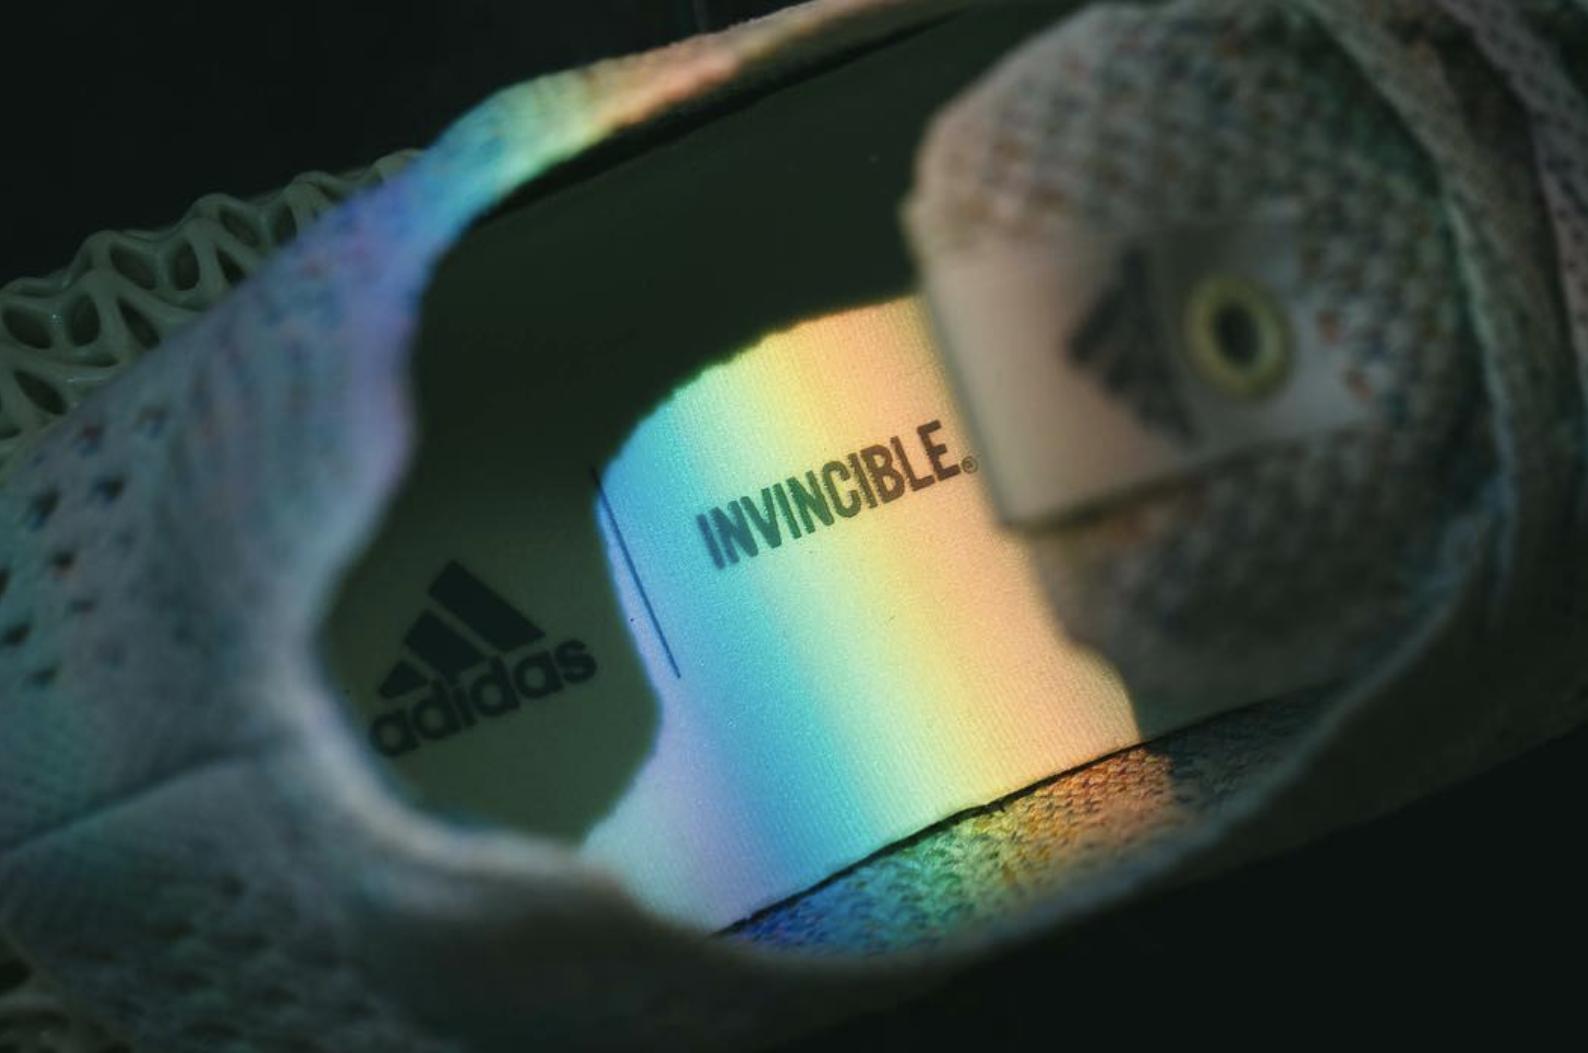 cf1fe6f21fa Invincible x Adidas Consortium 4D Release Date